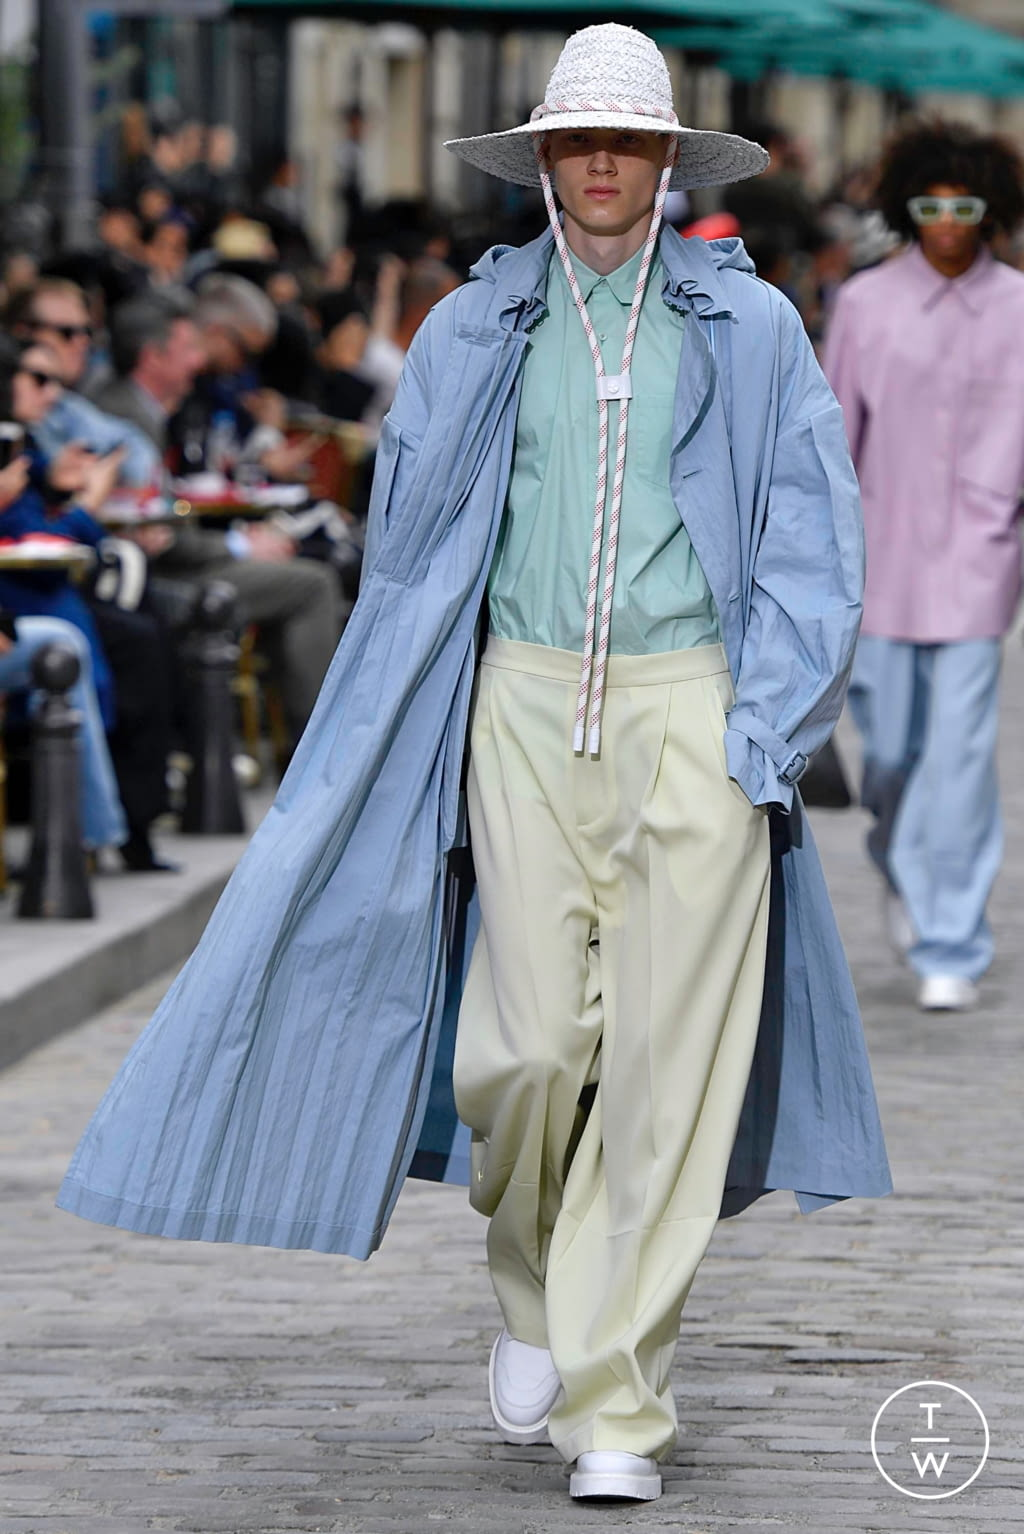 UK MADE Bébé Garçons Espagnol Style Romani Chapeau Gaufre Coton Flat Cap